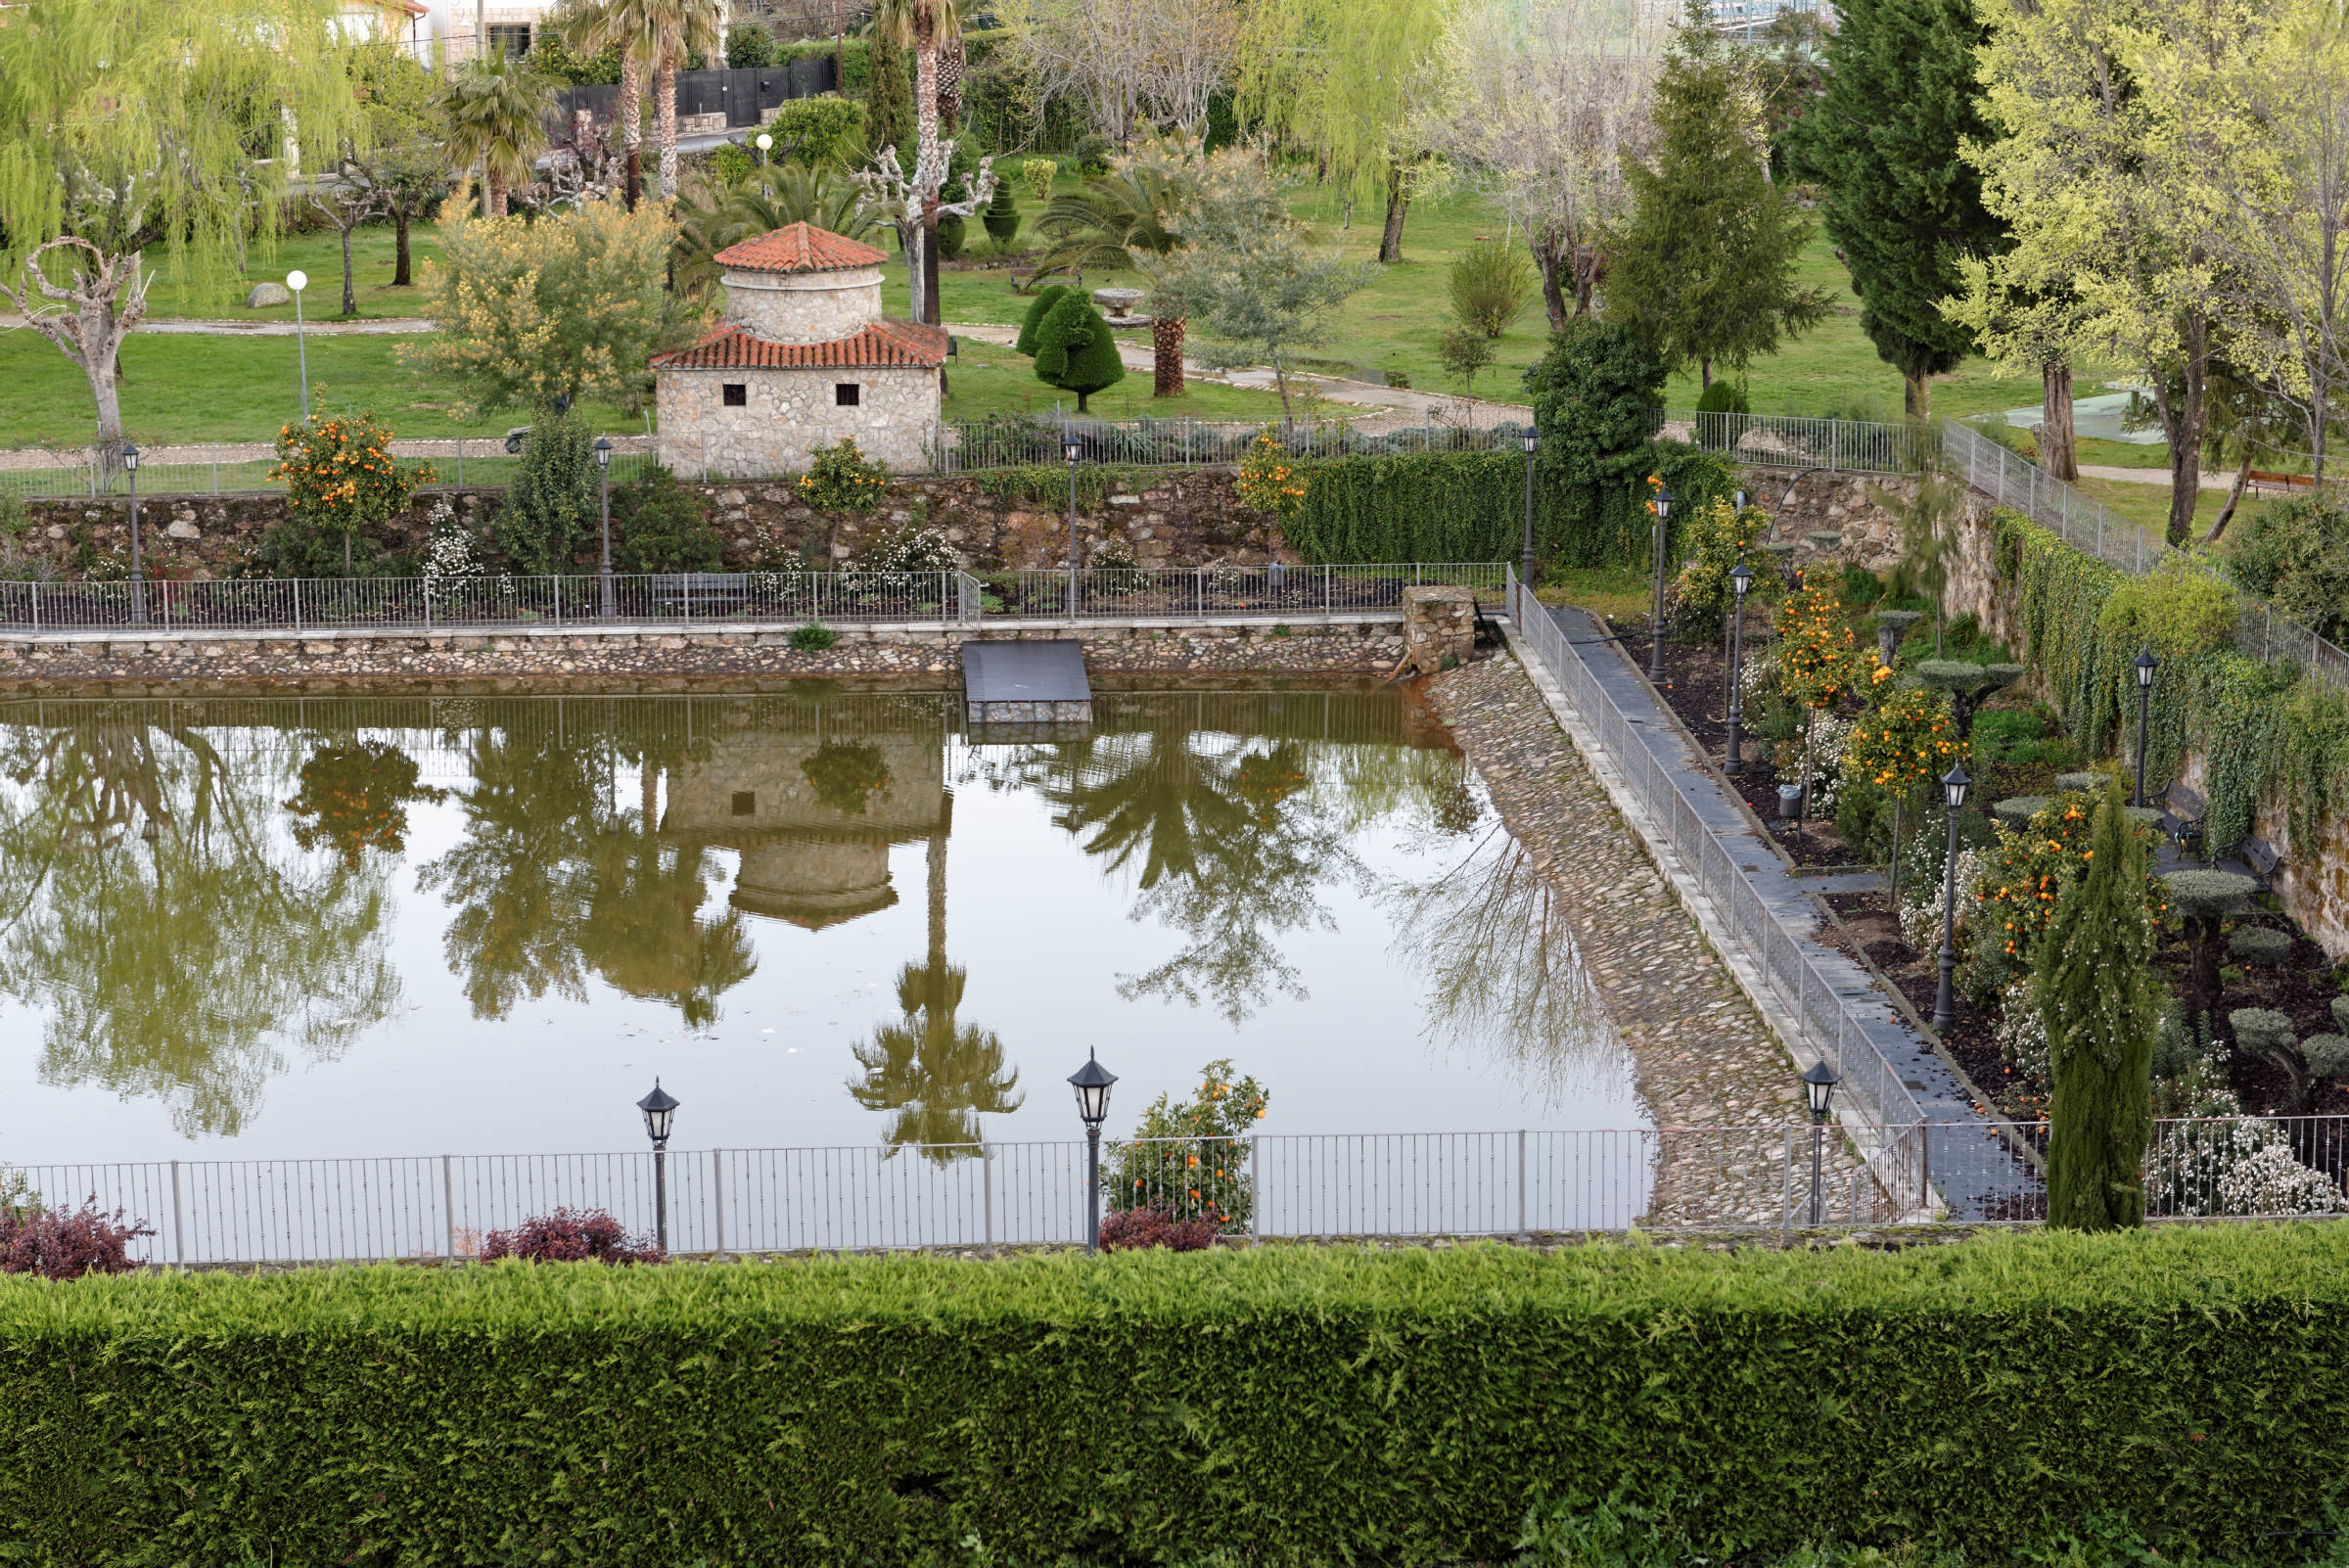 160404-Jarandilla de la Vera (Estremadure) (134)